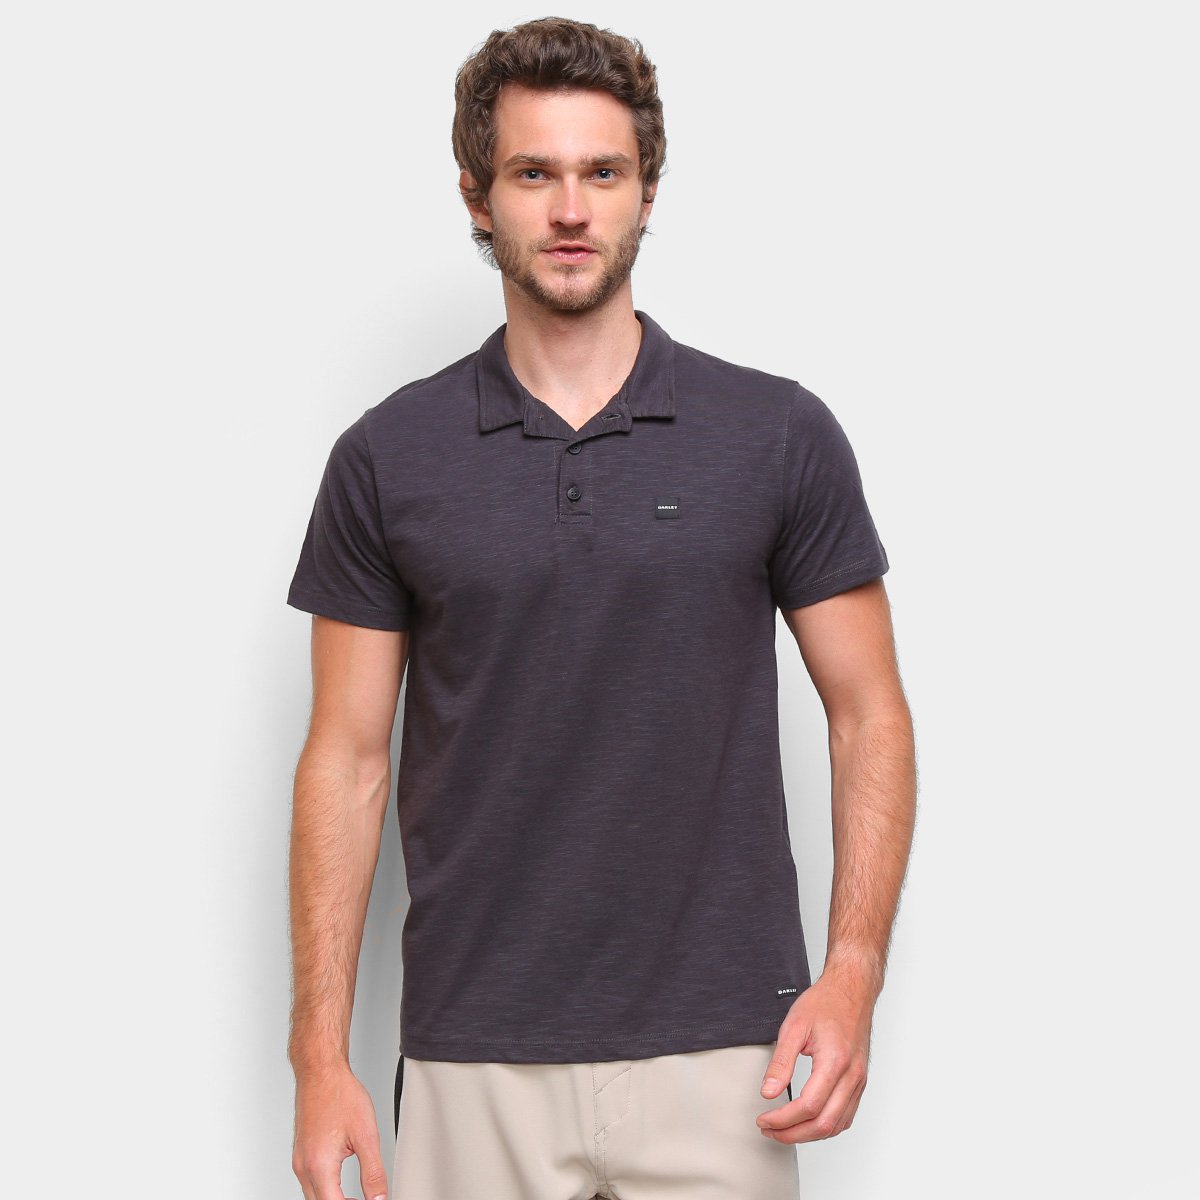 Camisa Polo Oakley Slub 2.0 Masculina